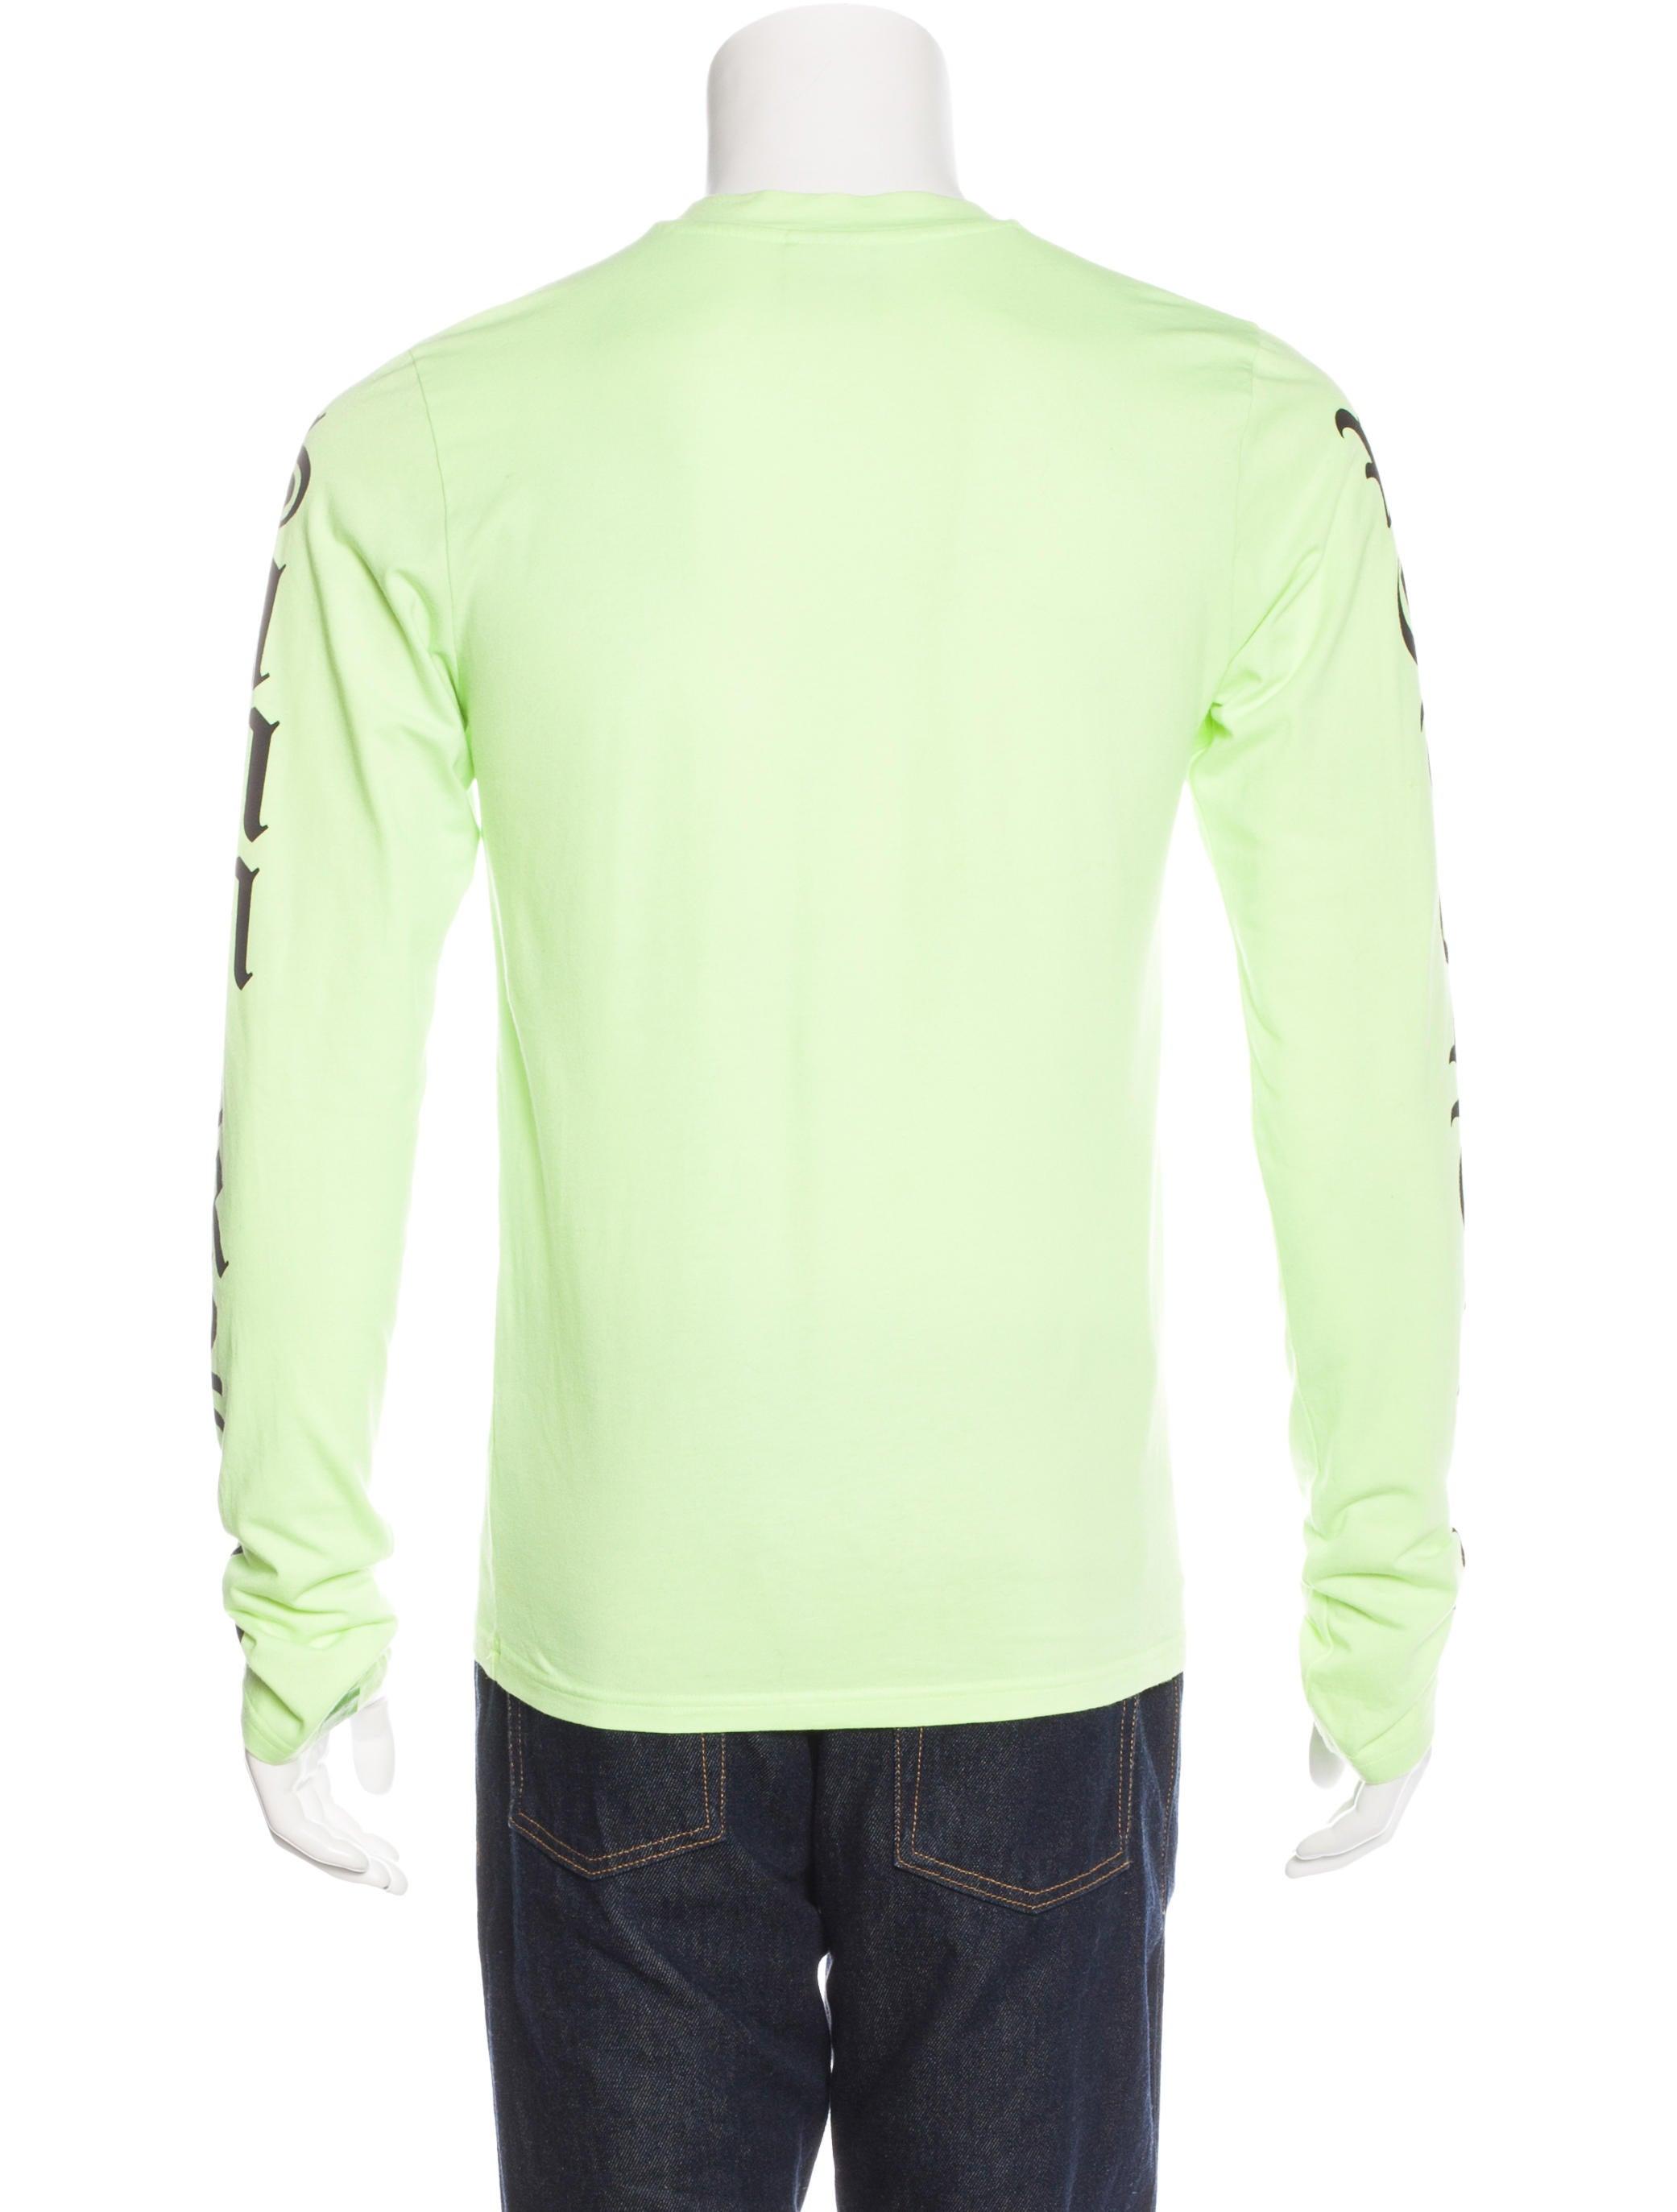 Vetements 2016 Summer Long Sleeve T-Shirt - Clothing - VTM20142 ...